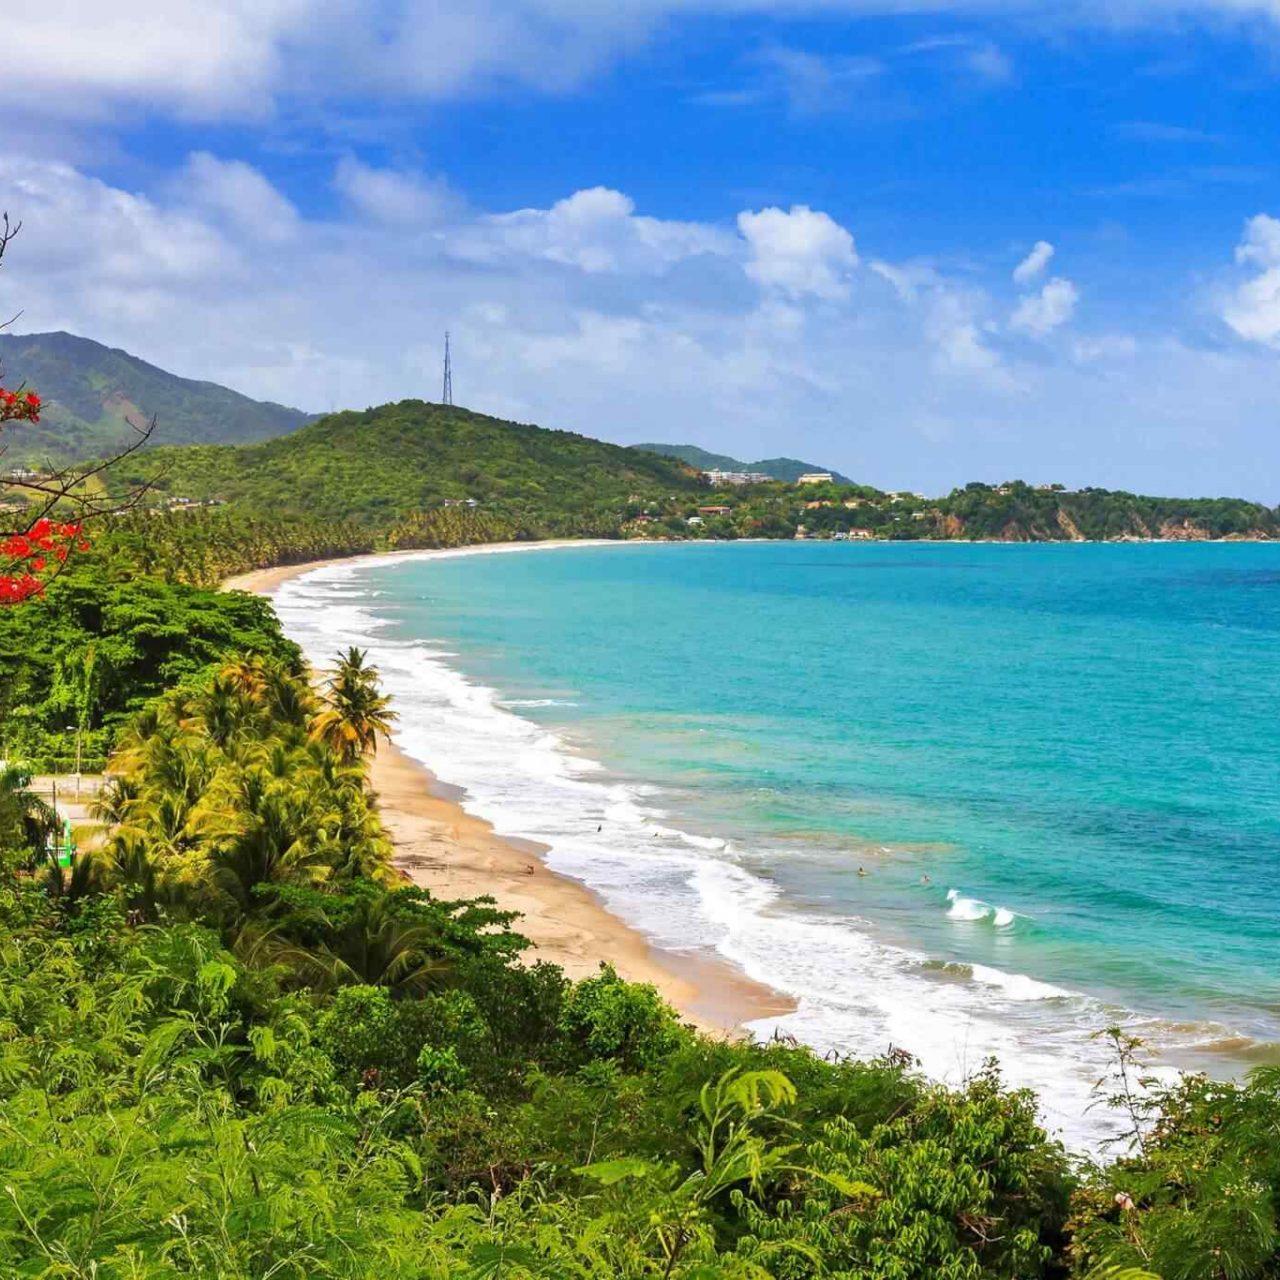 https://bsl.com.mt/wp-content/uploads/2018/09/destination-puerto-rico-01-1280x1280.jpg